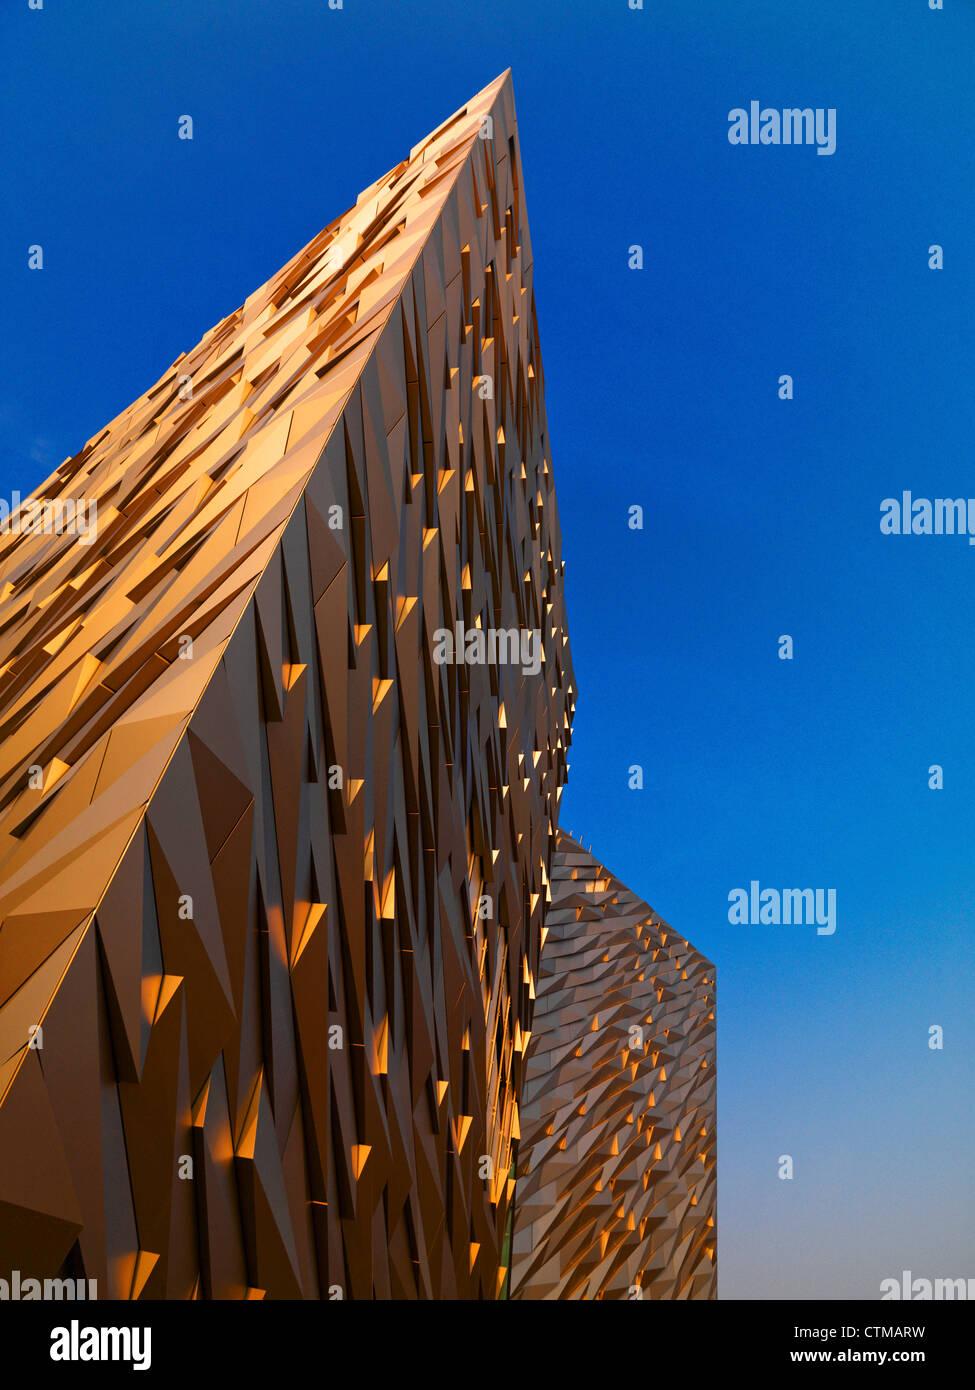 Titanic Belfast - Stock Image